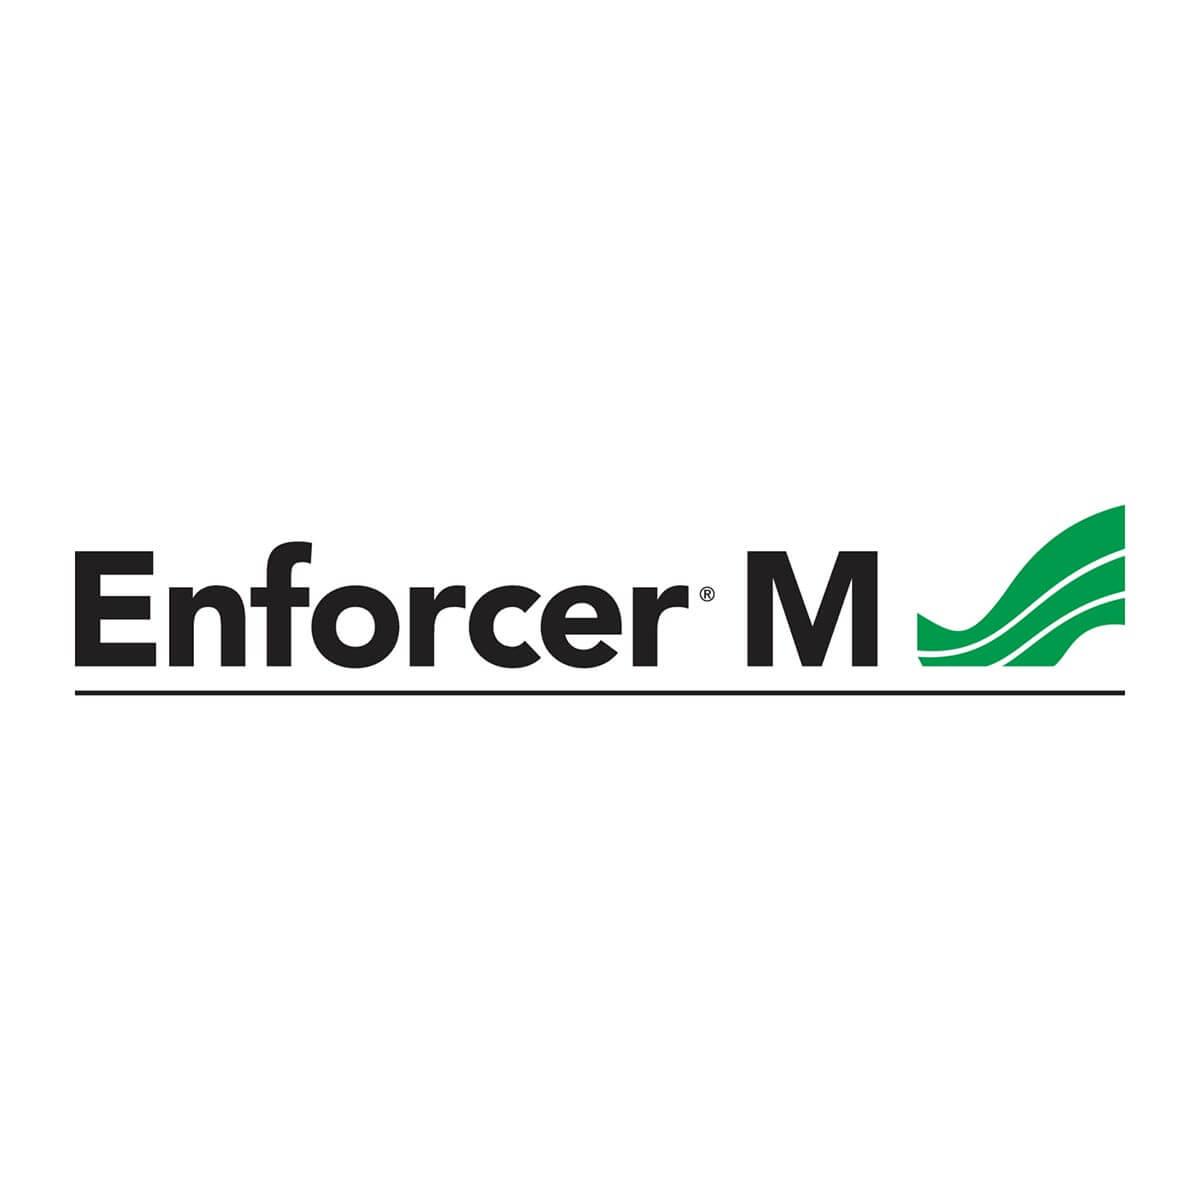 ENFORCER M 480L